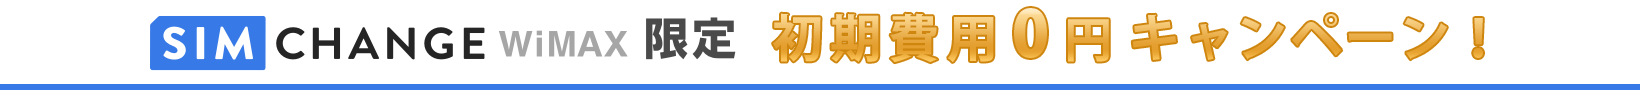 SIMCHANGE WiMAX限定 新春お年玉キャンペーン!